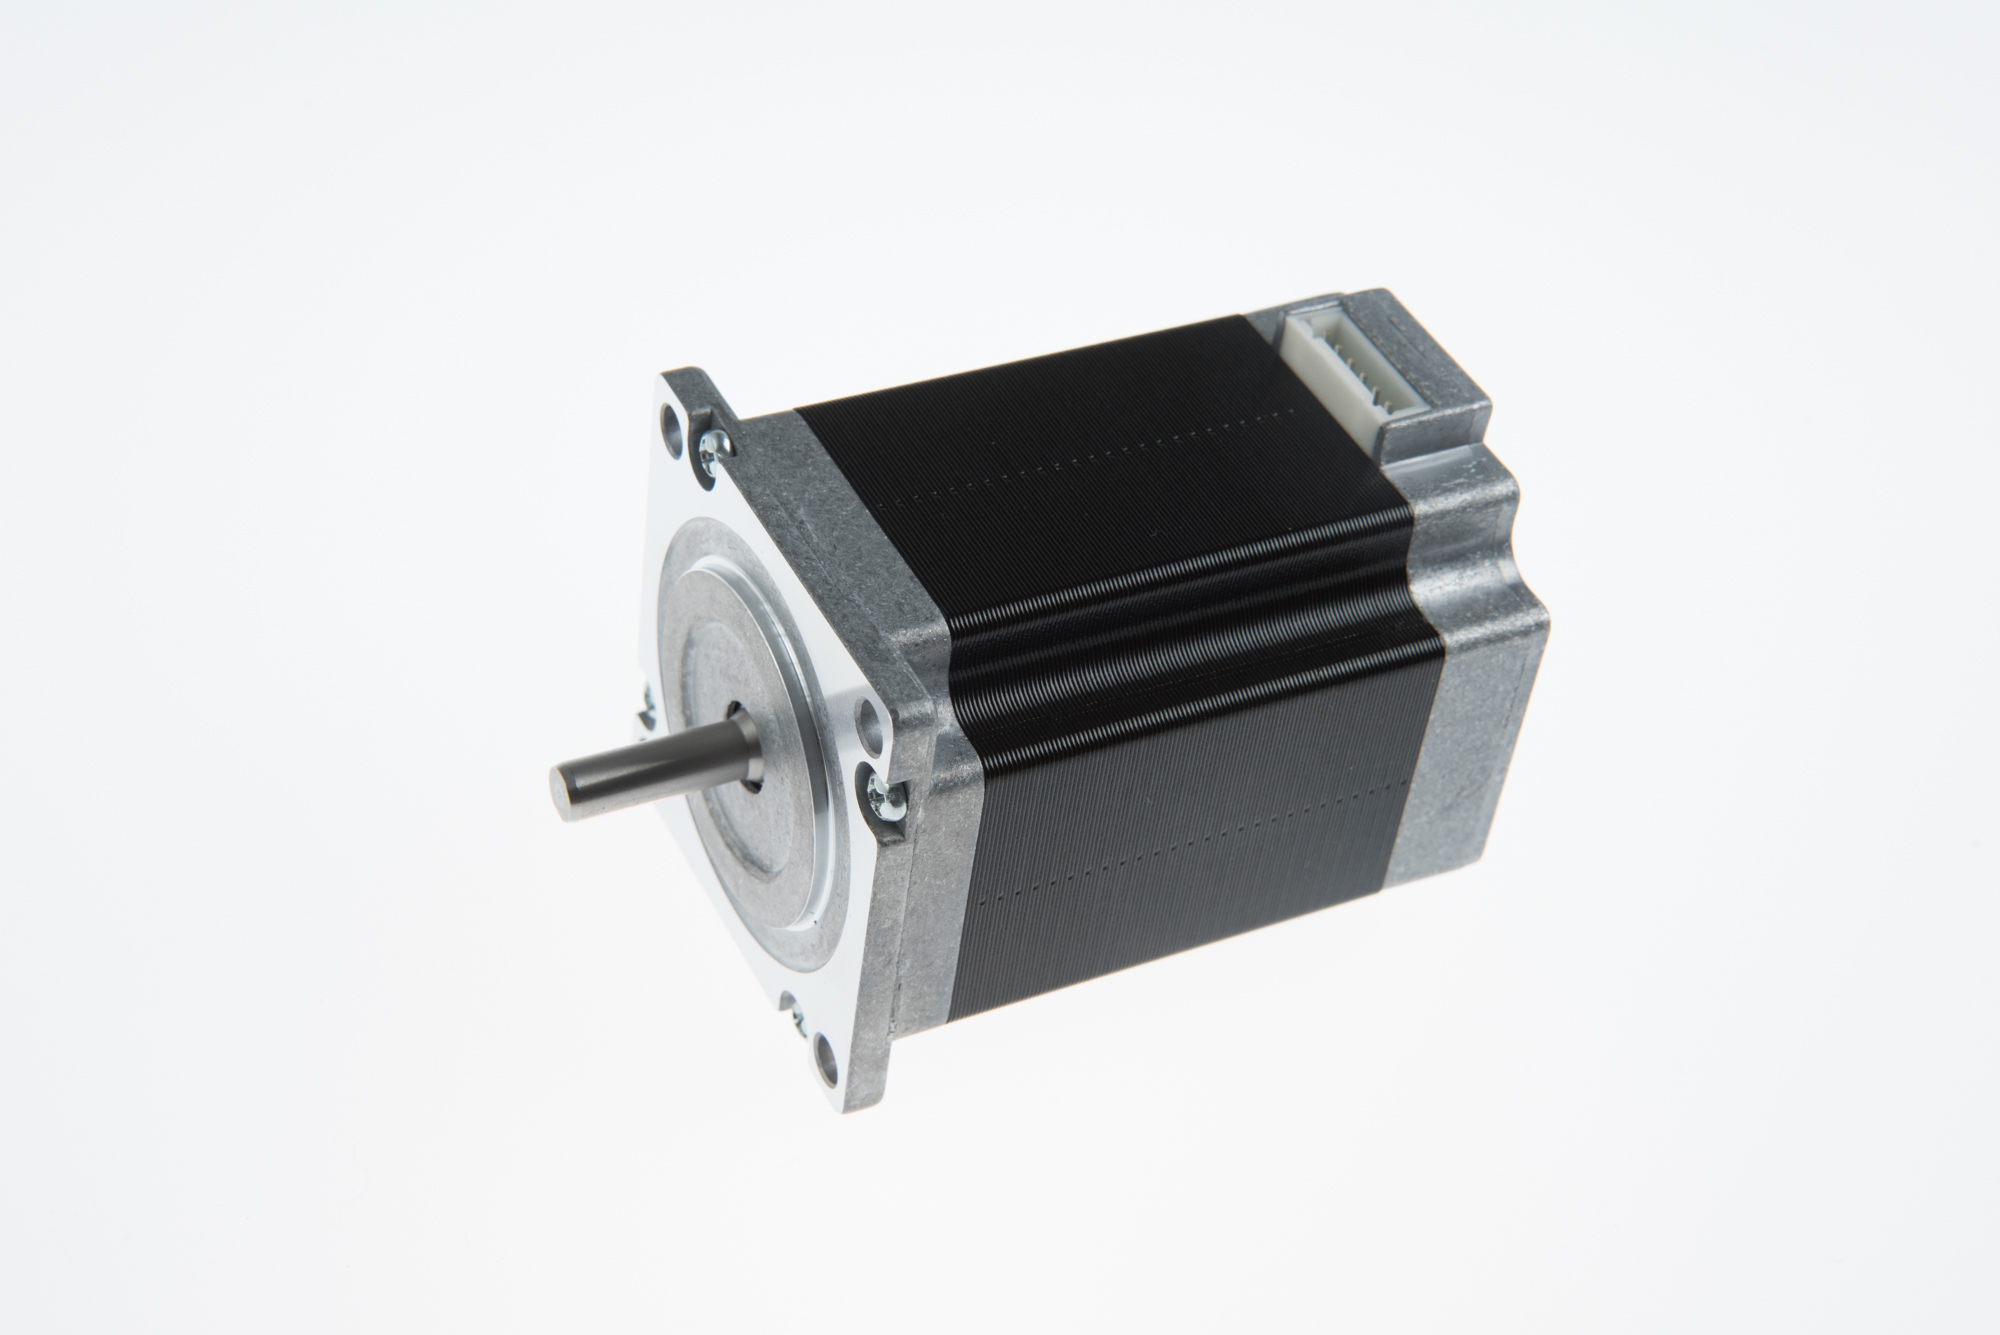 ODM Manufacturer Bag Making Machine Motor Driver - NEMA 23 step angel 0.9 degree connector type hybrid stepping motor  (76mm 1.8N.m) – PROSTEPPER Featured Image